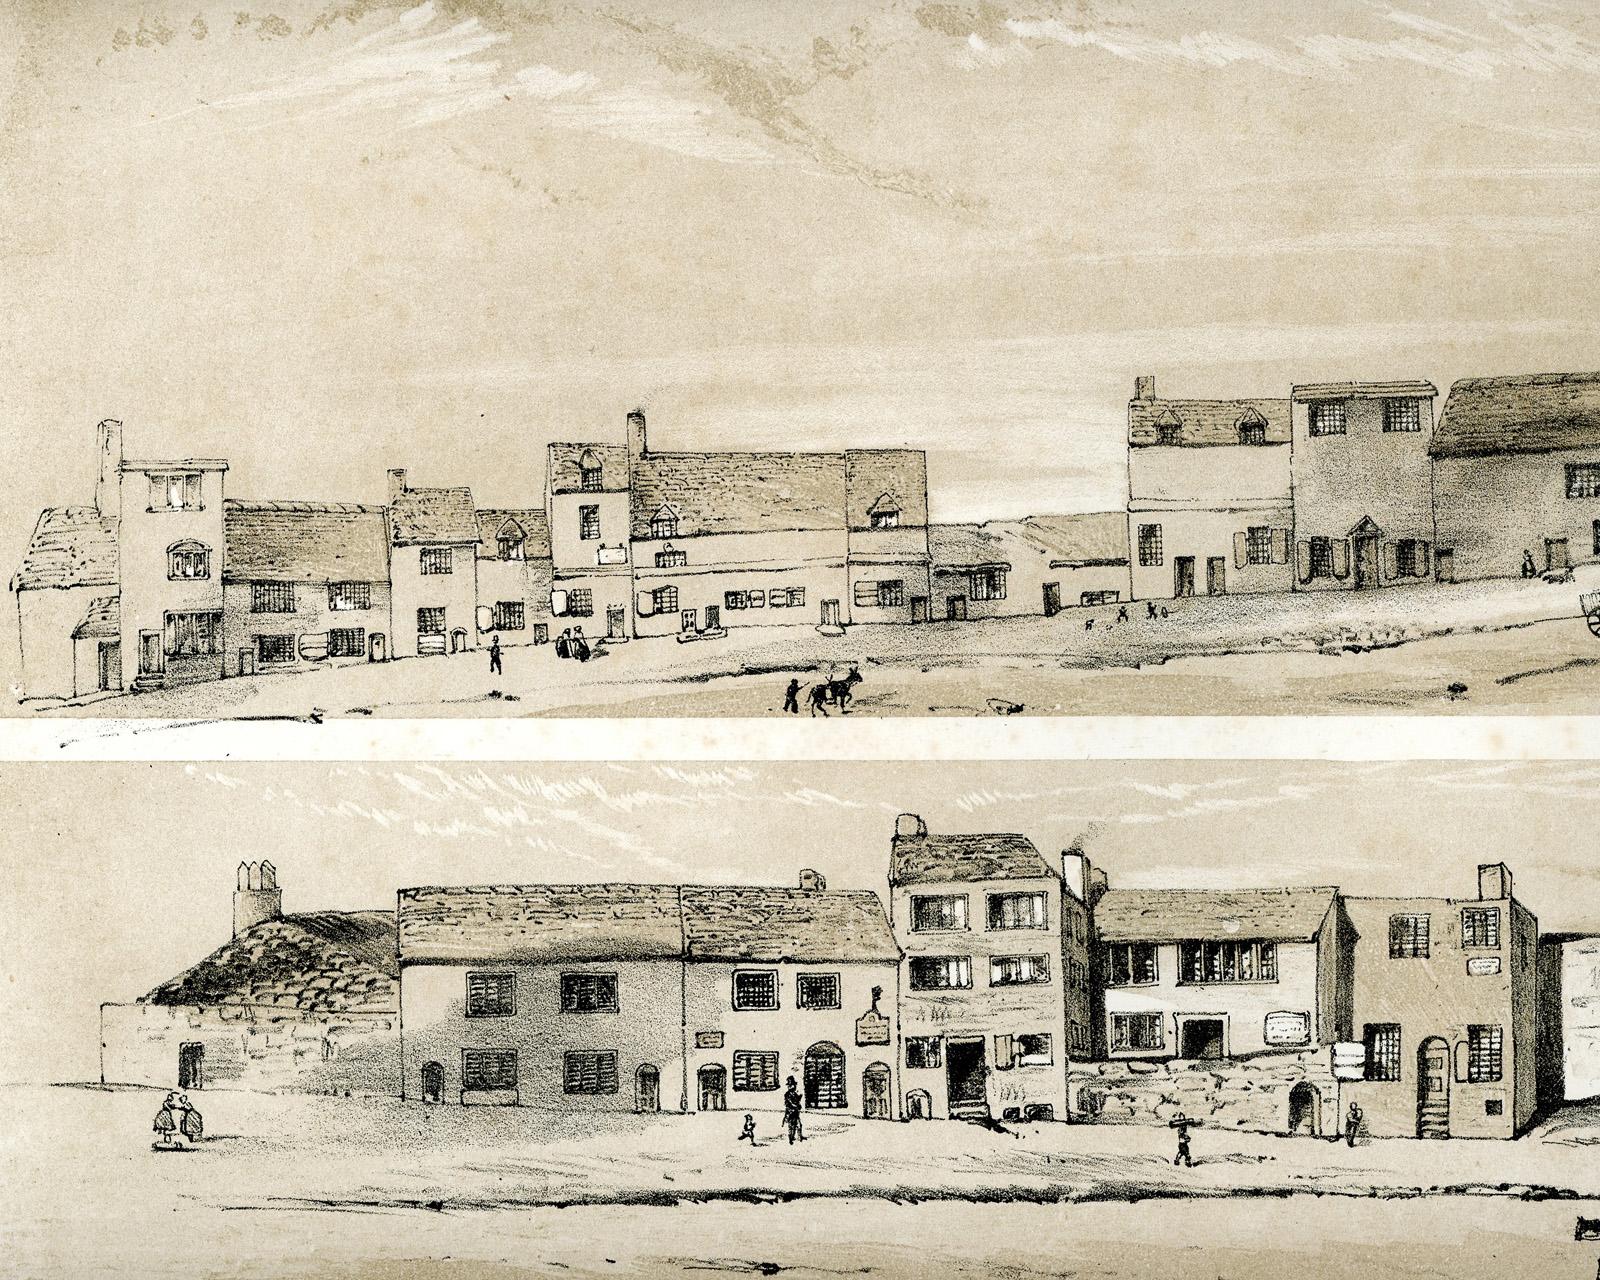 Pinfold Street